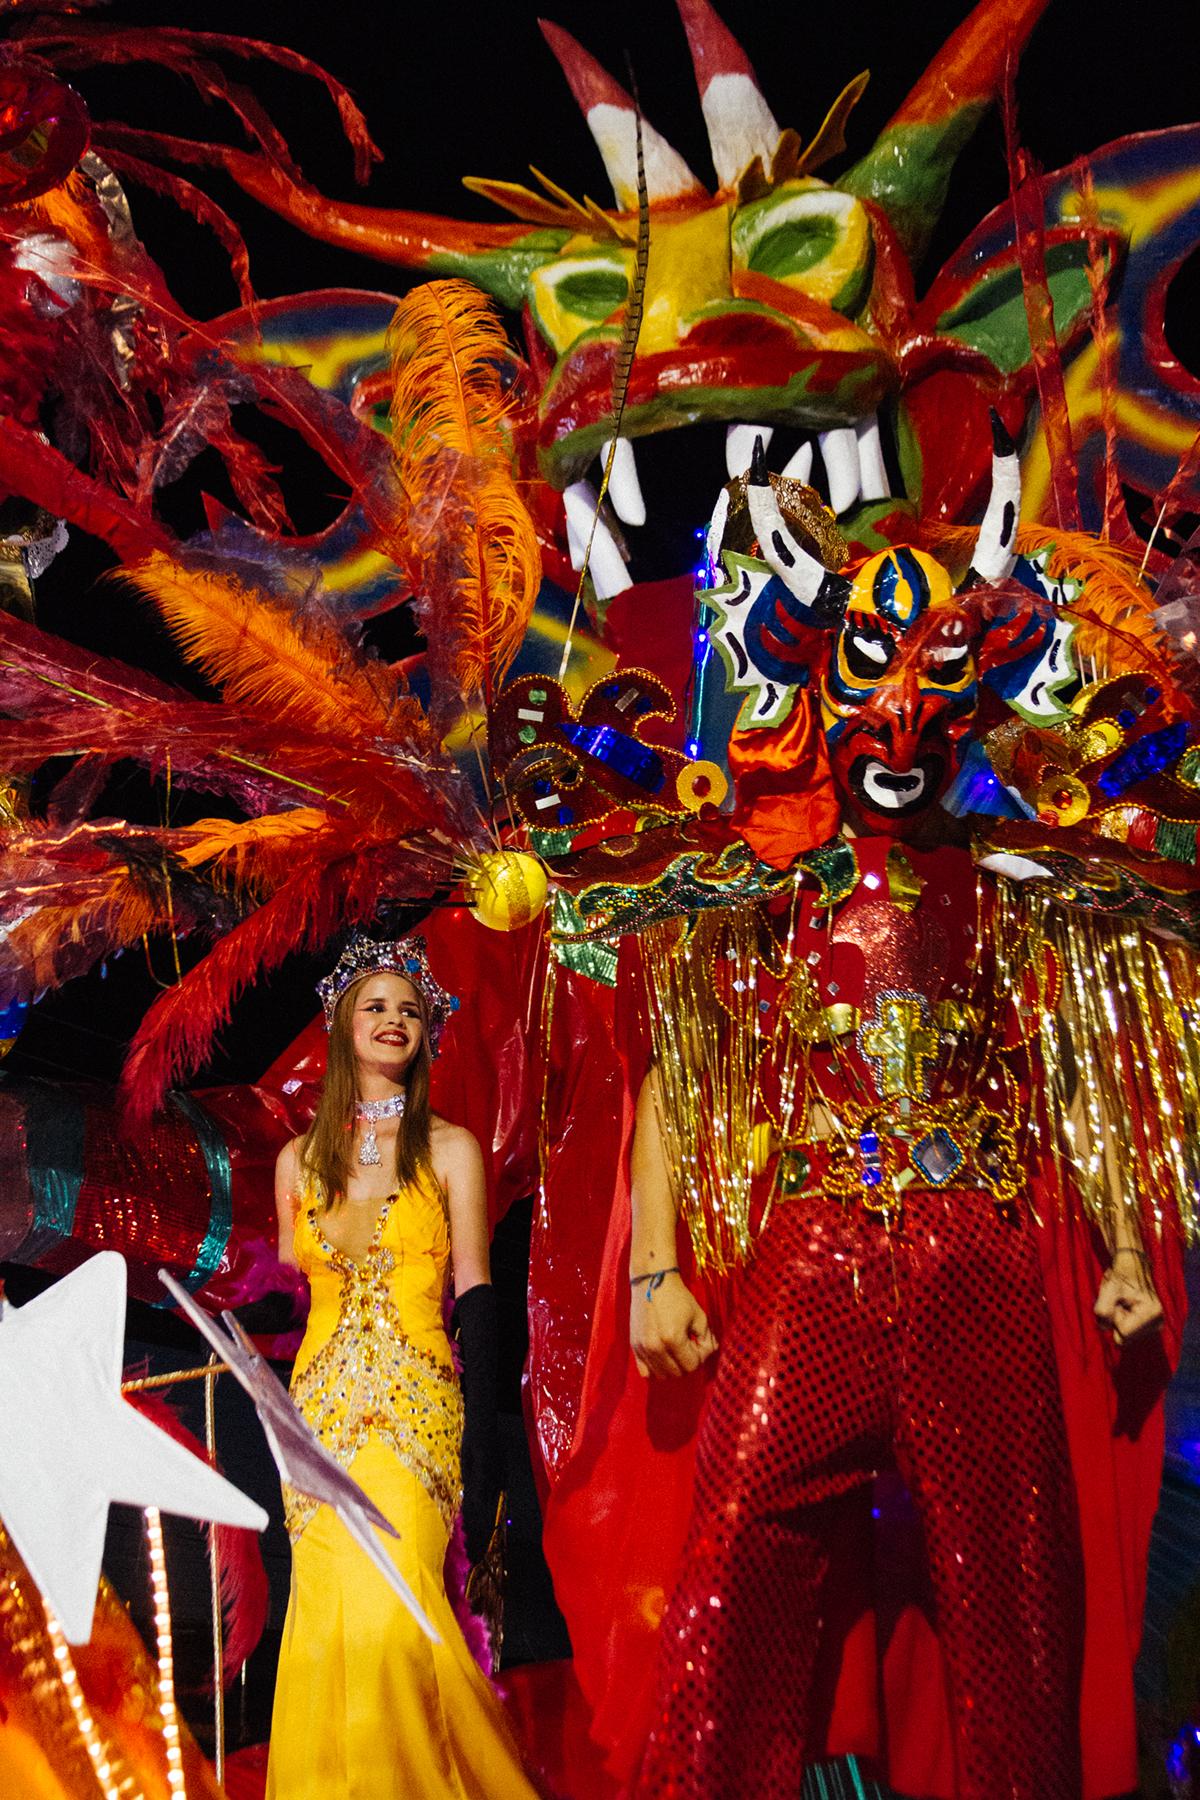 Carnaval venezuela guanare